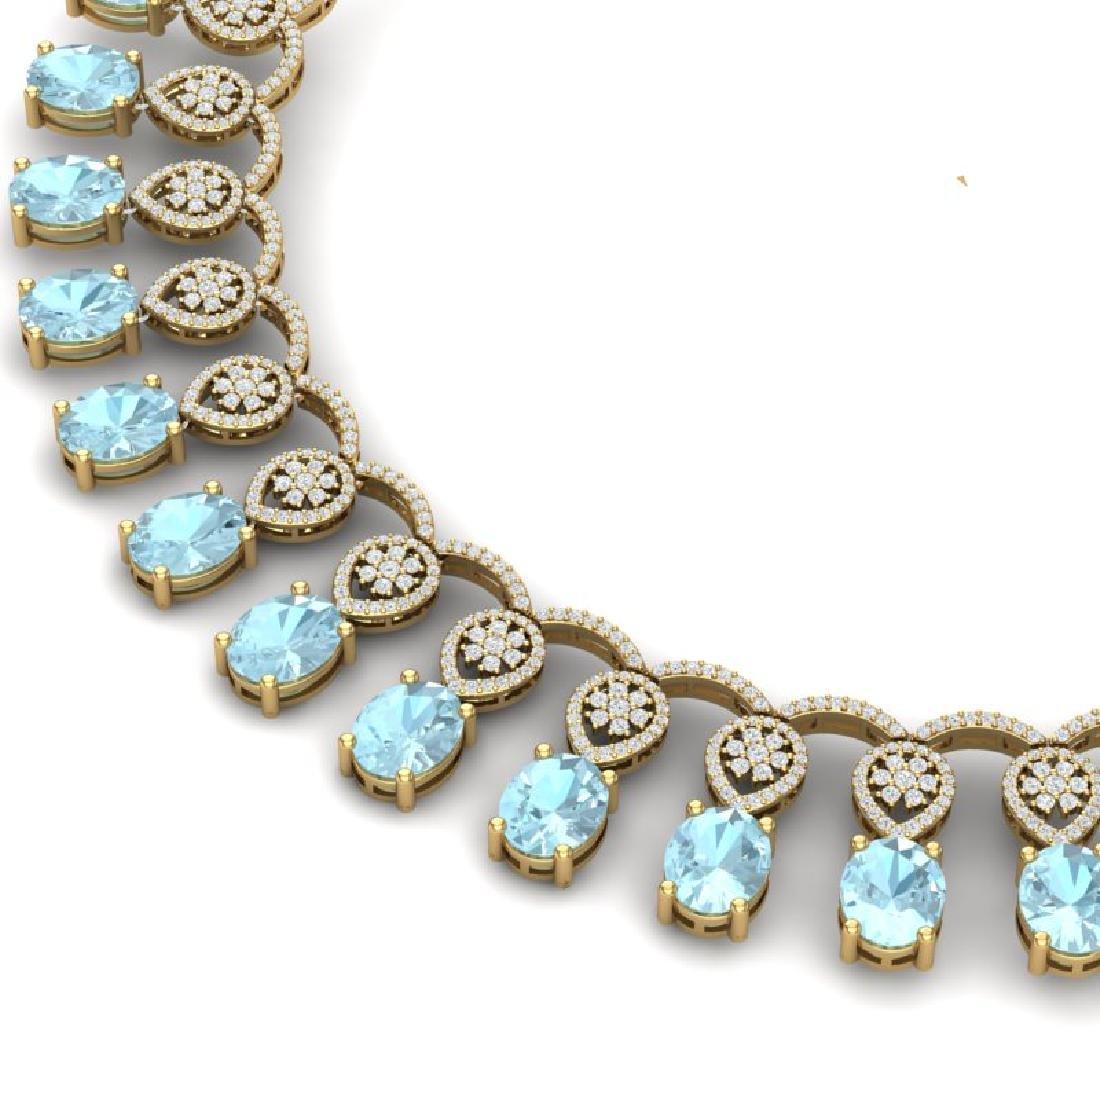 55.35 CTW Royalty Sky Topaz & VS Diamond Necklace 18K